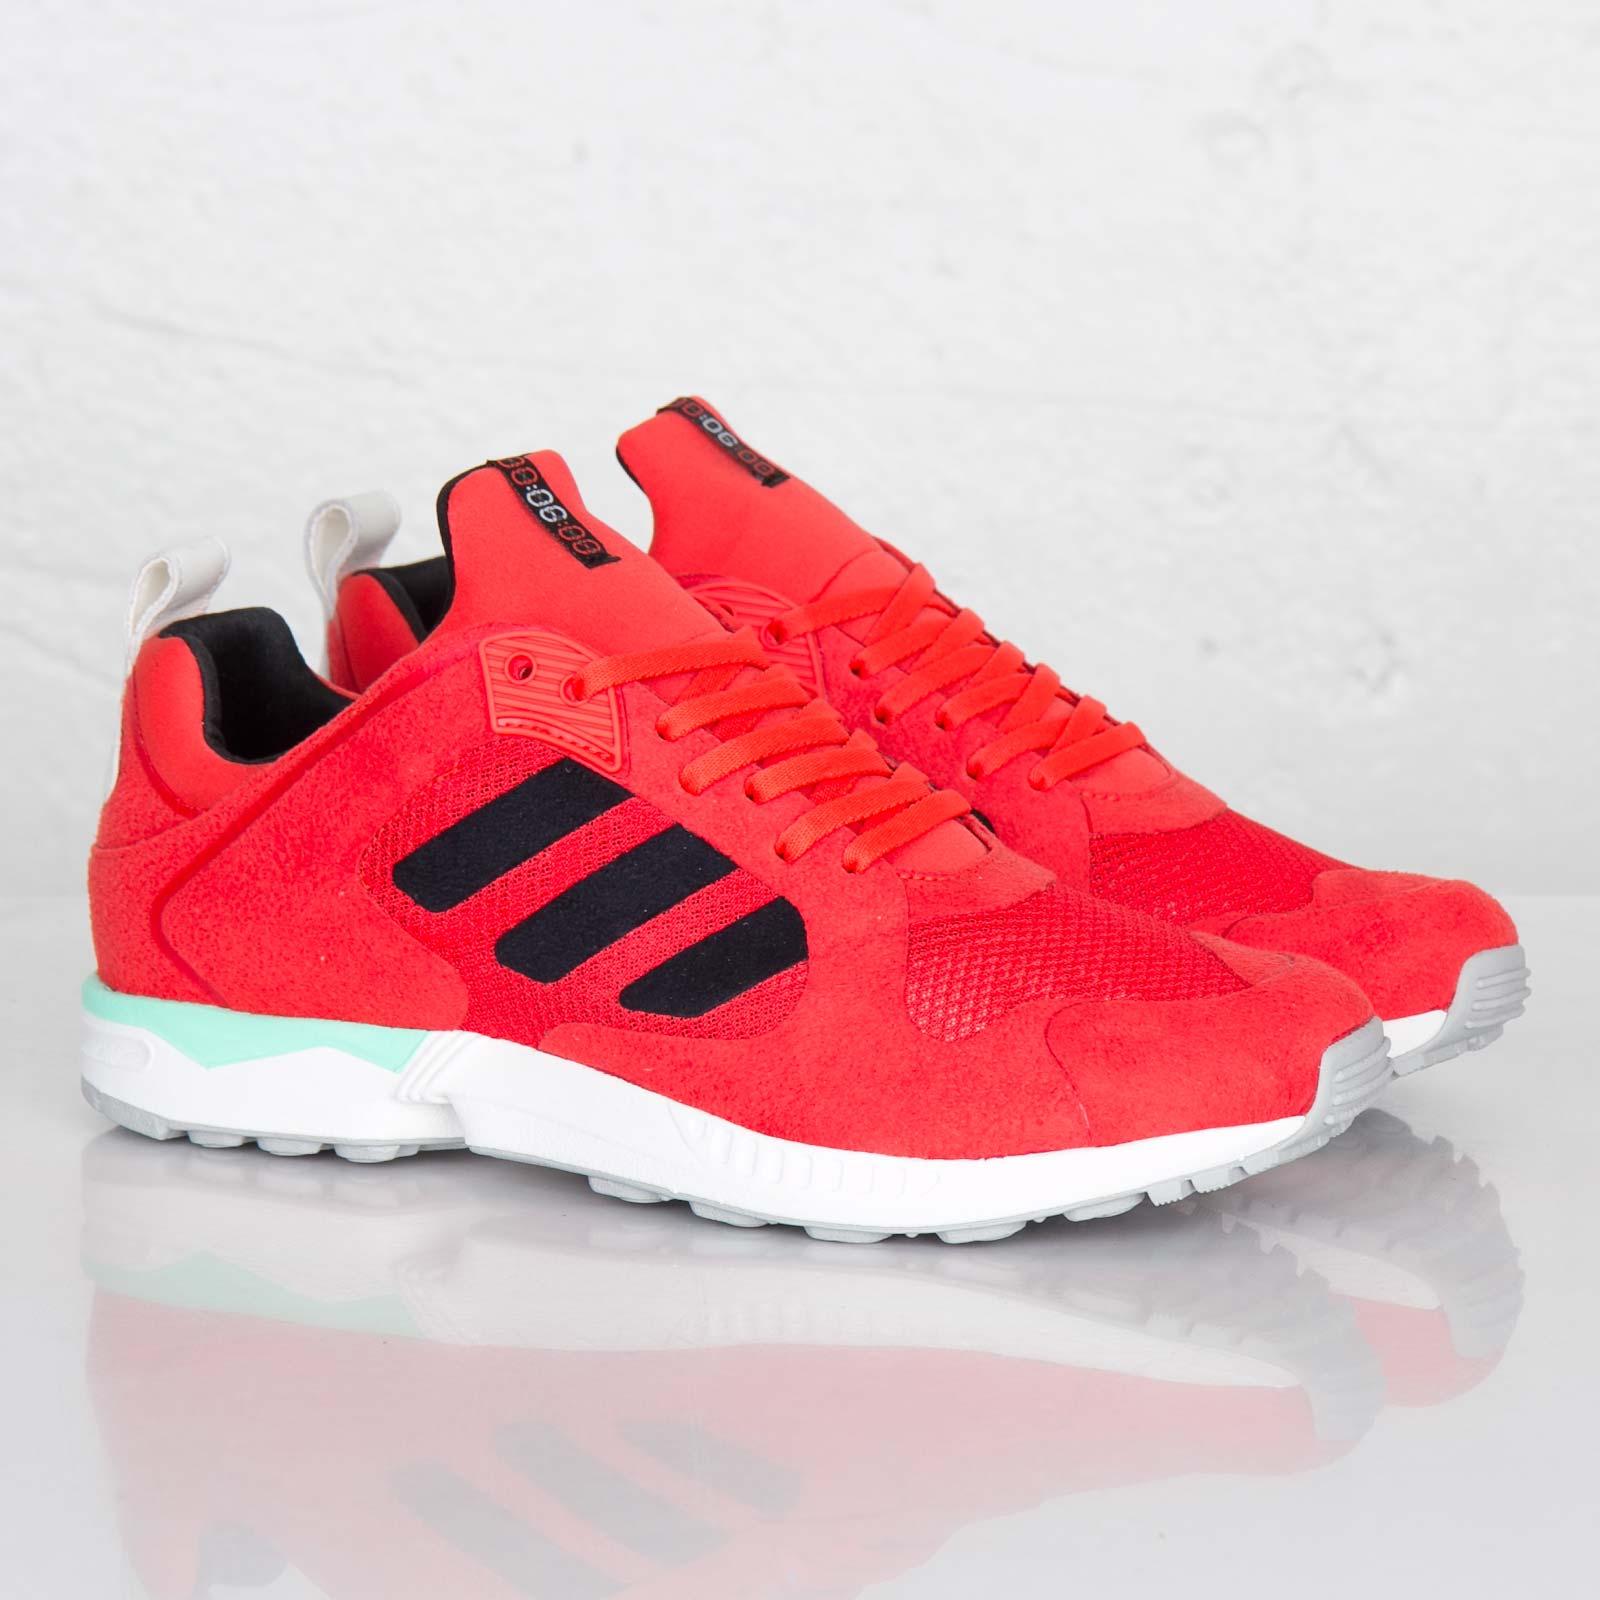 e2368df62185d adidas ZX 5000 RSPN 80 90 00 - D67351 - Sneakersnstuff I Sneakers ...